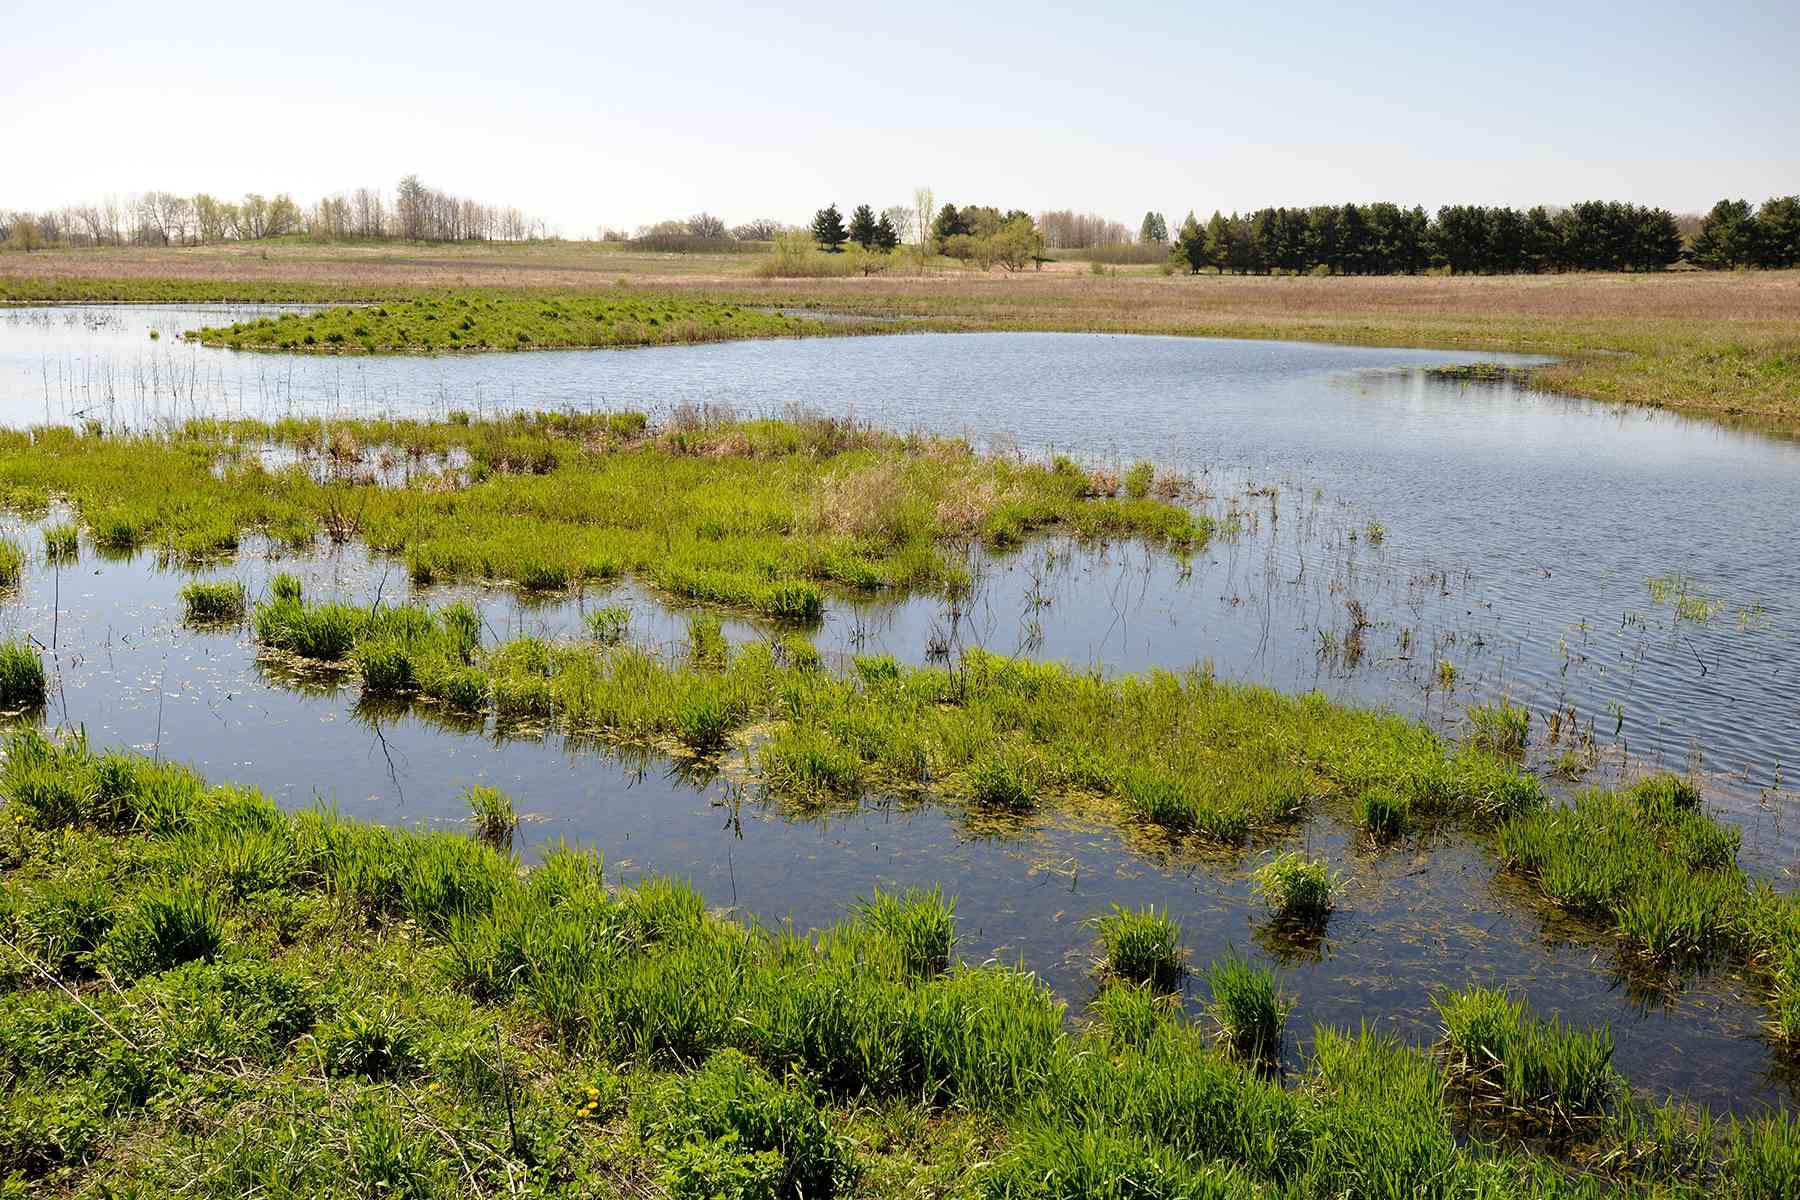 wetland under conservation easement in Iowa